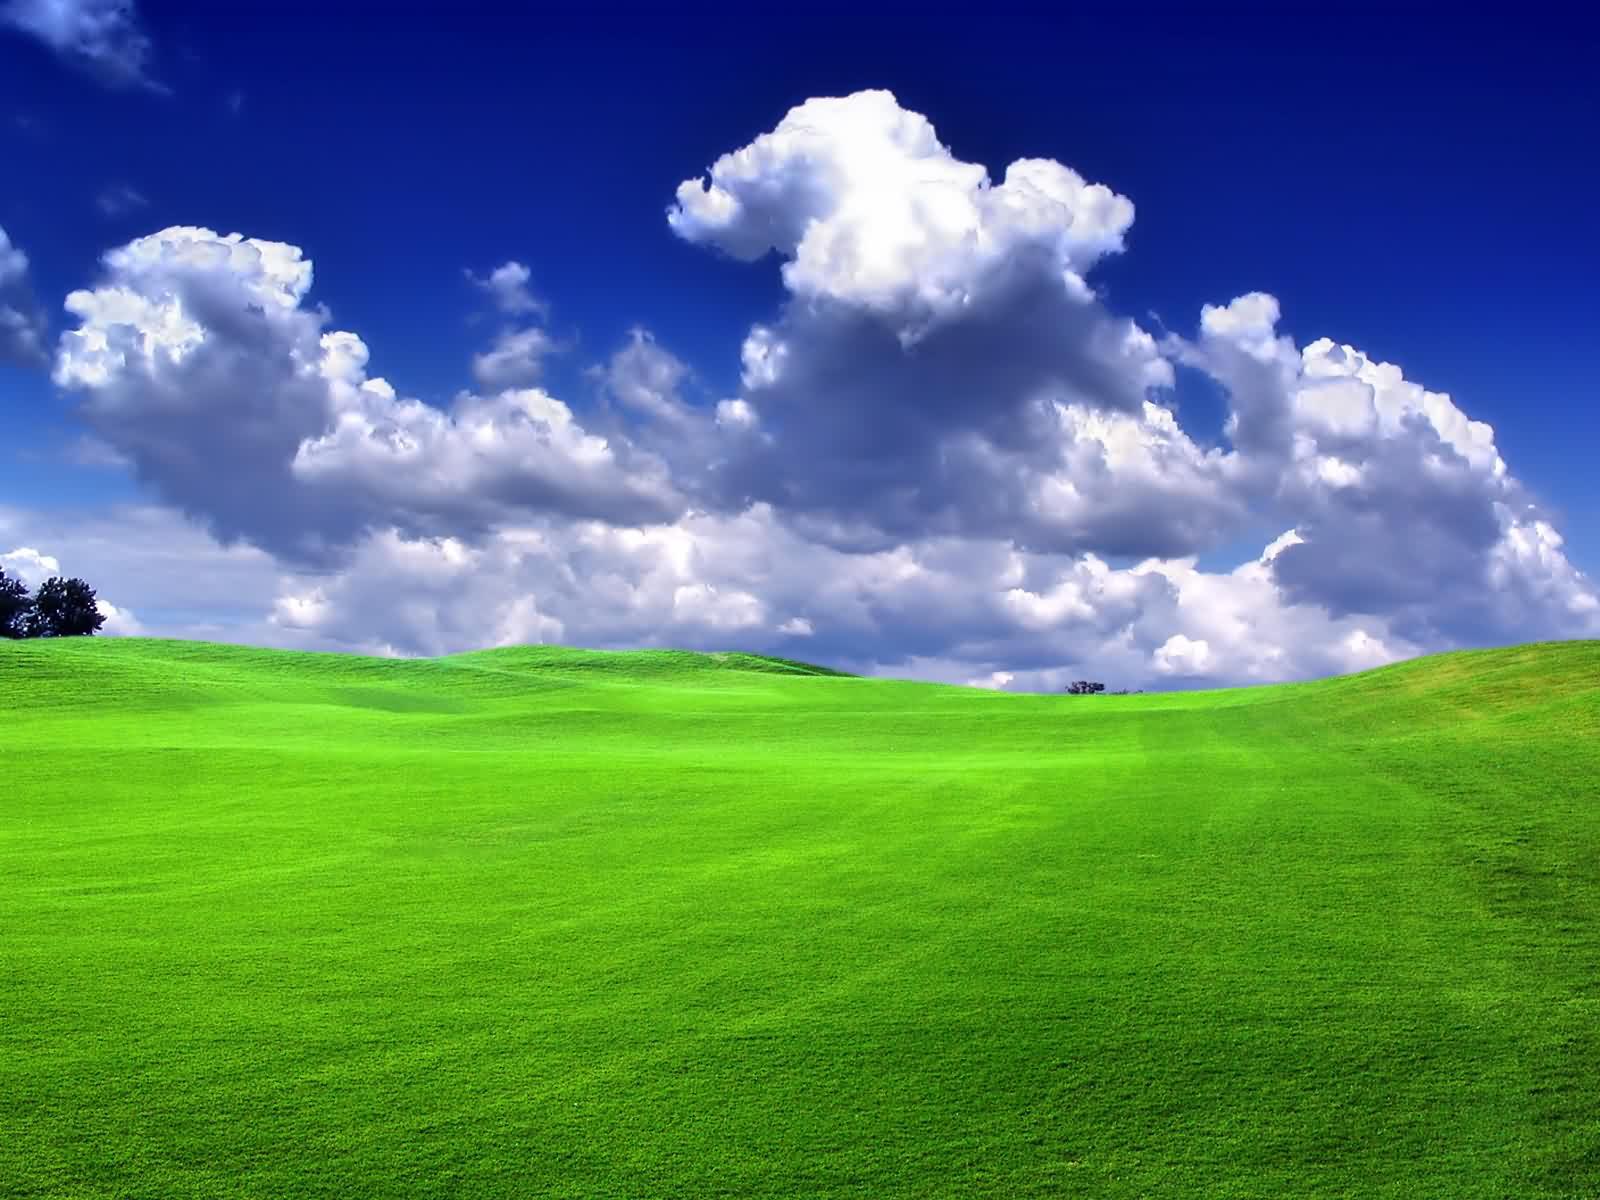 HD Wallpapers of Windows XP HD Wallpapers